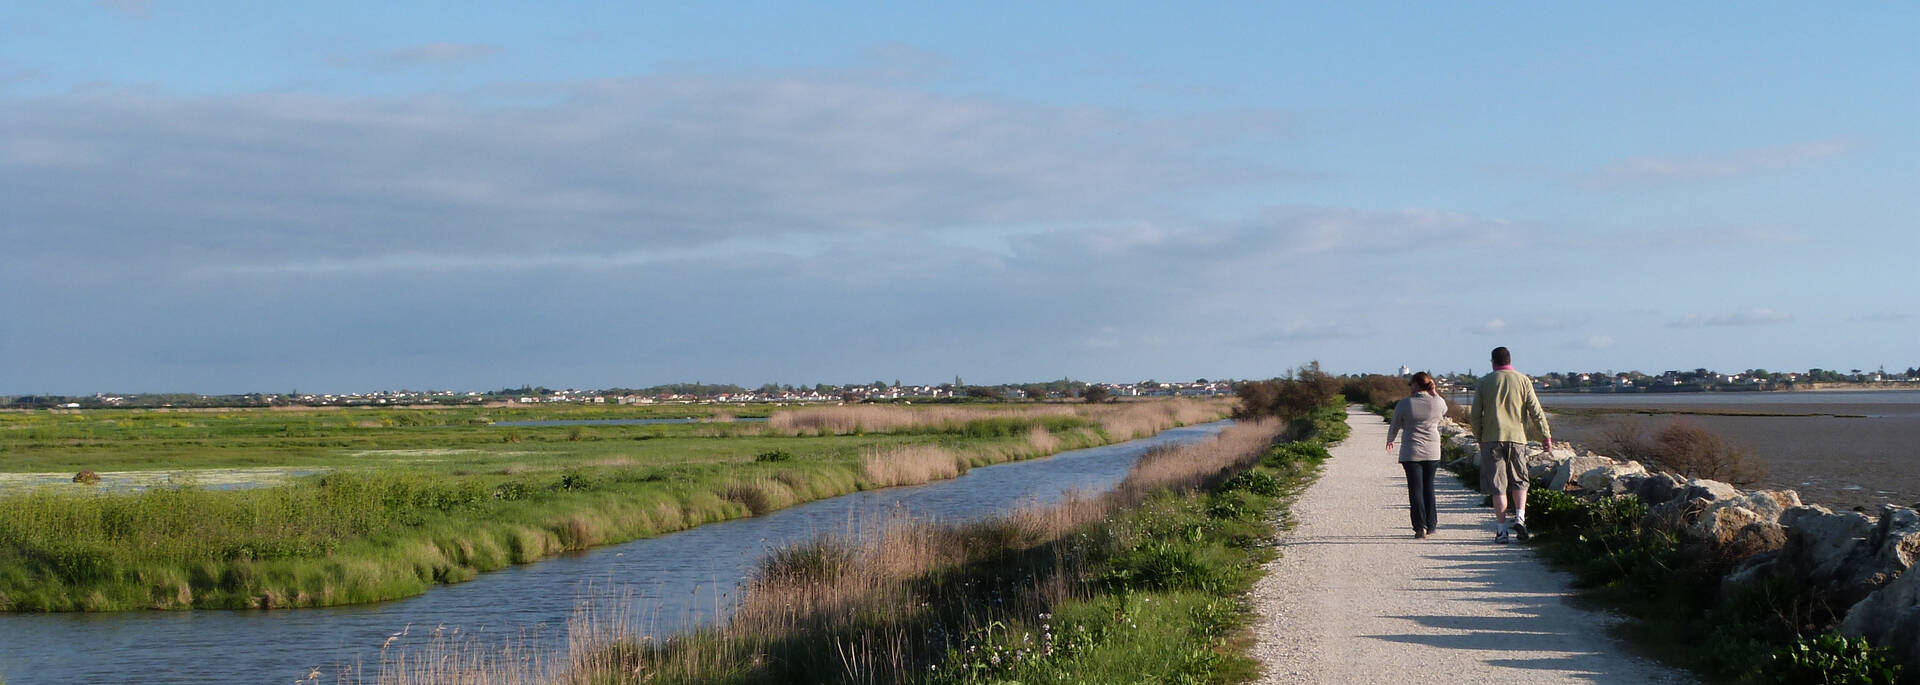 Trails along the channels of the marshes - © Office de tourisme Rochefort Océan